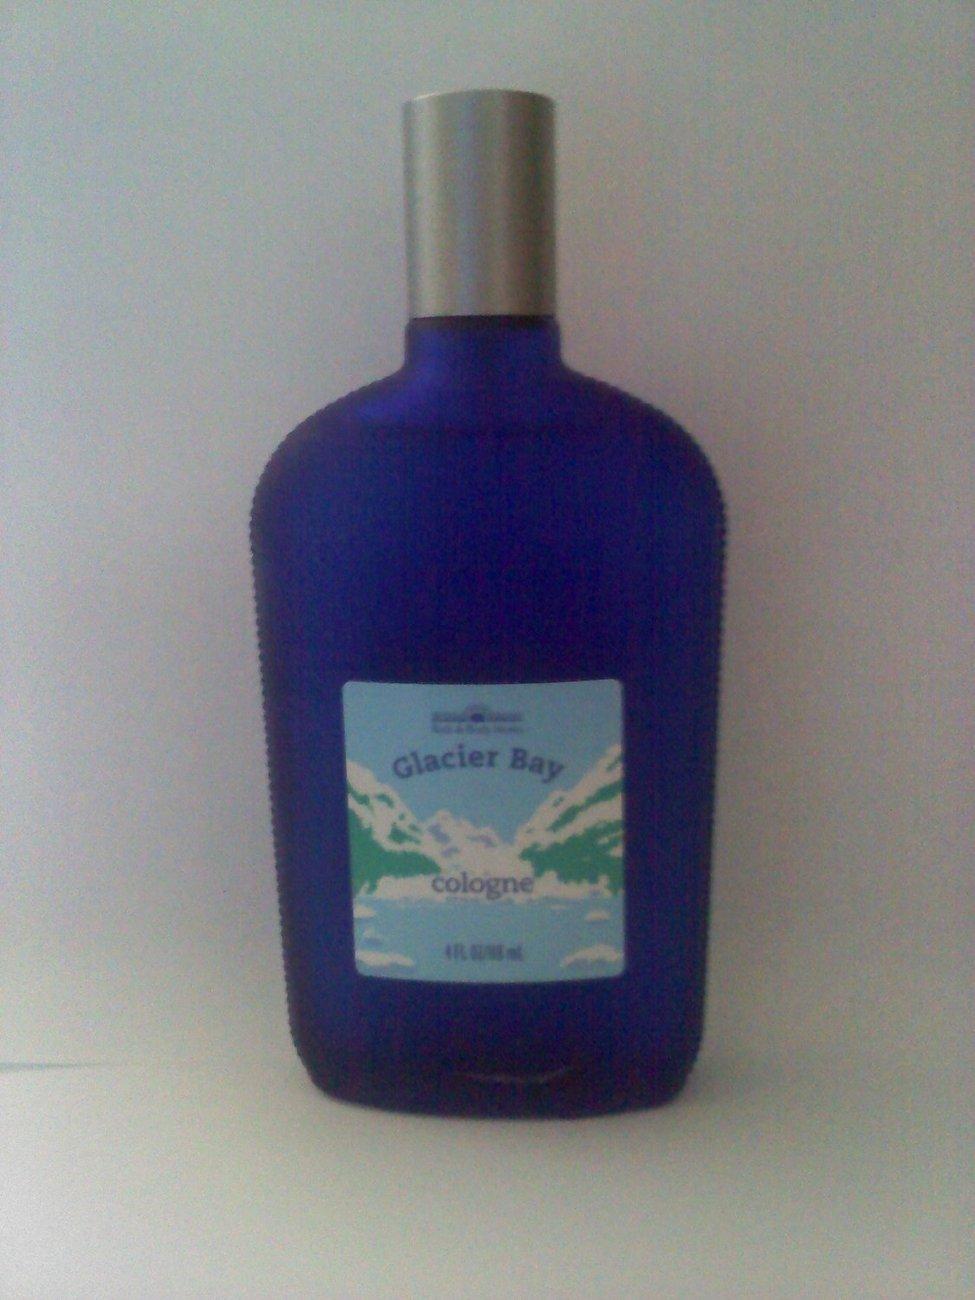 Bath & Body Works Men's GLACIER BAY Cologne 4 fl oz / 118 ml